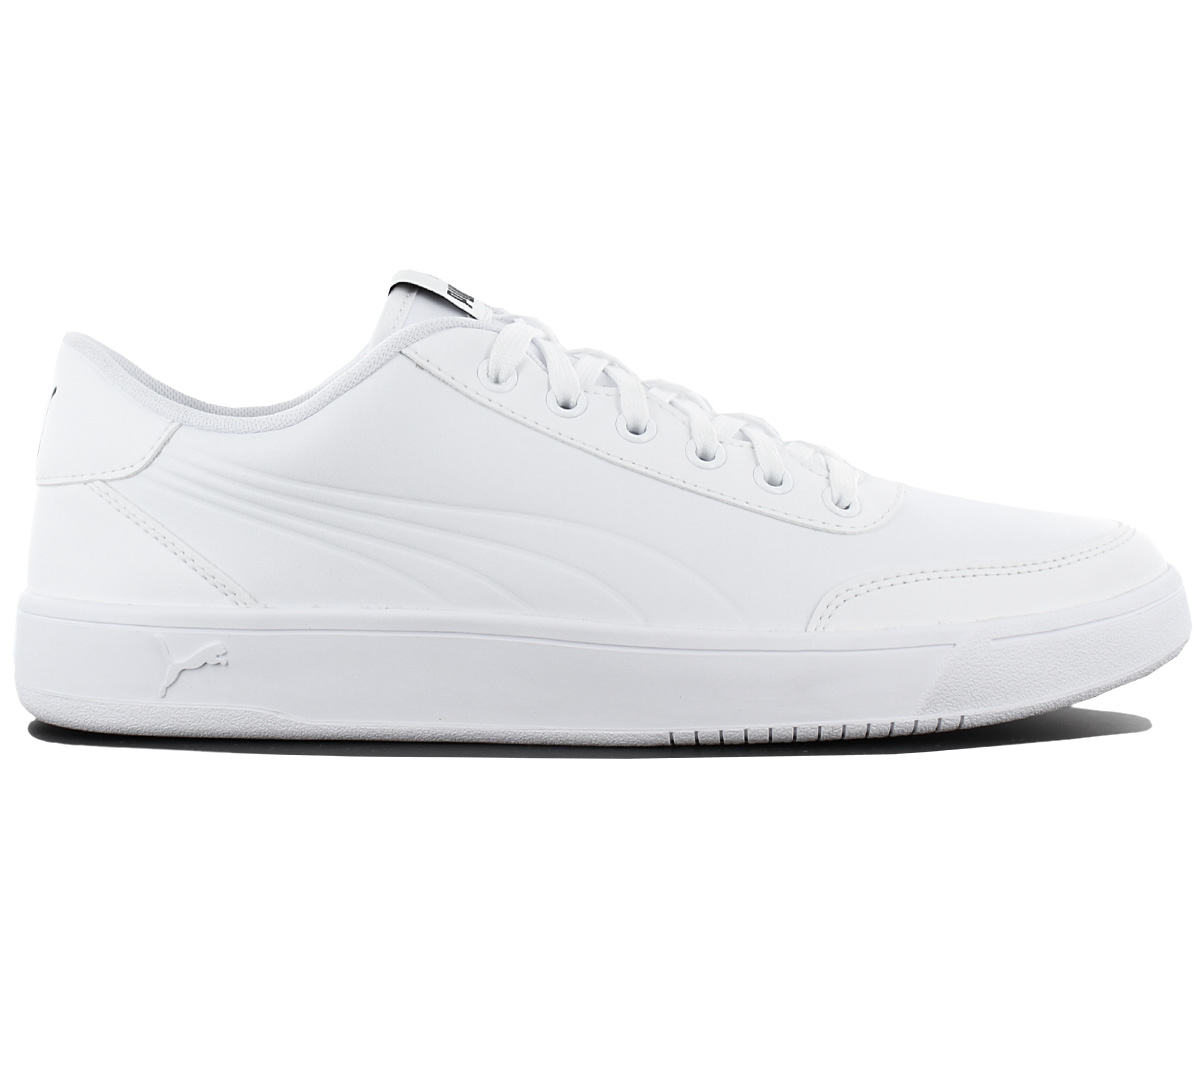 Puma Court Breaker L Mono Herren Sneaker Schuhe Leder Weiß ... cab76d3808